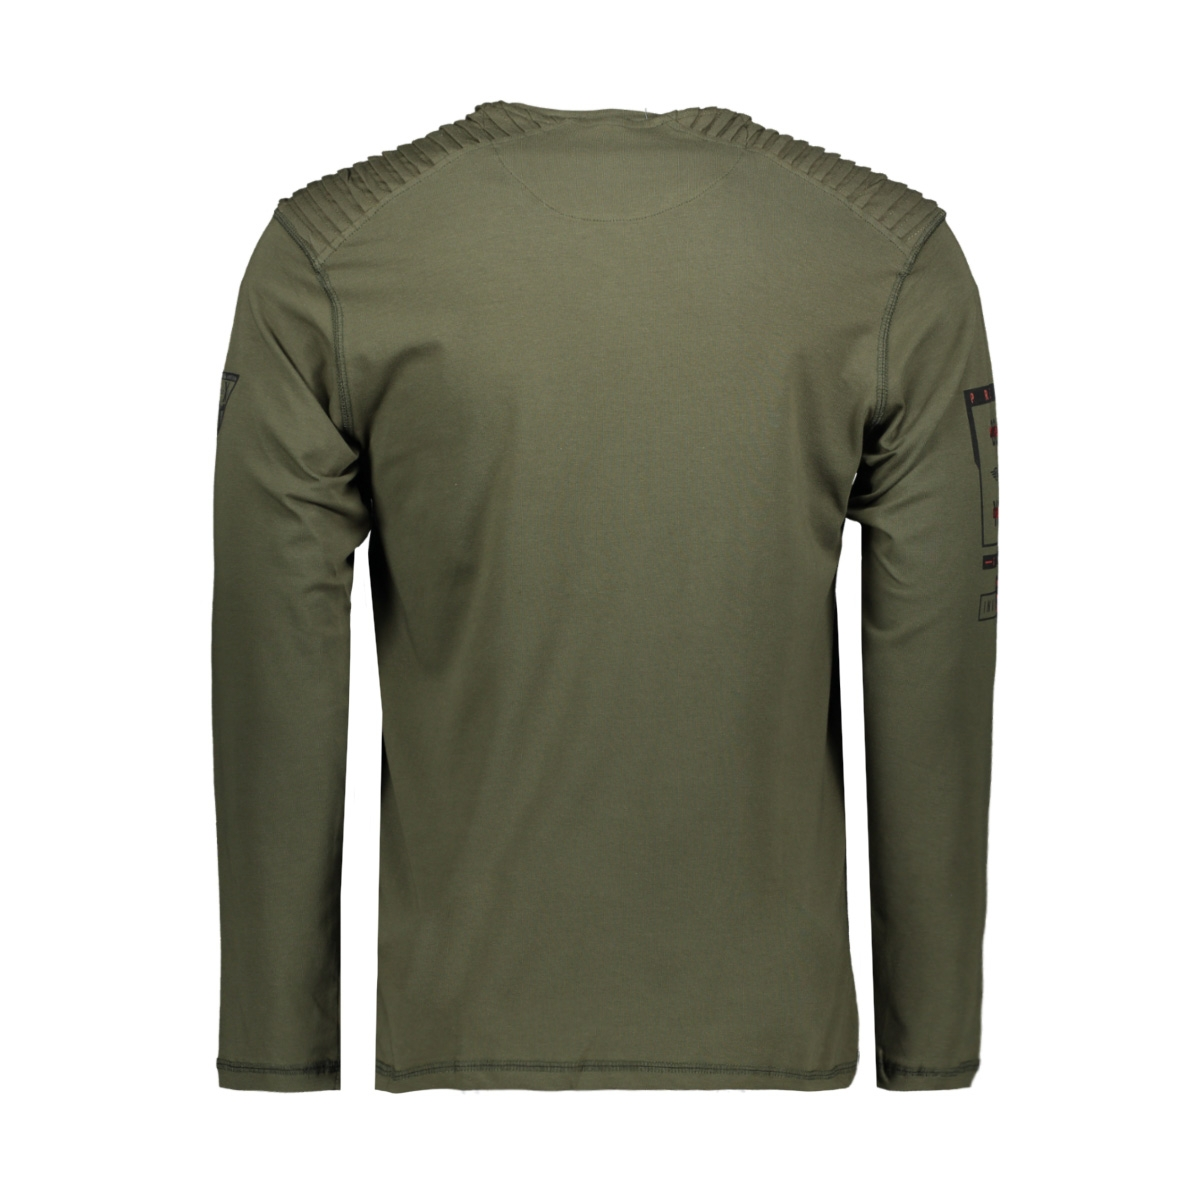 gabbiano t shirt 13857 gabbiano t-shirt army